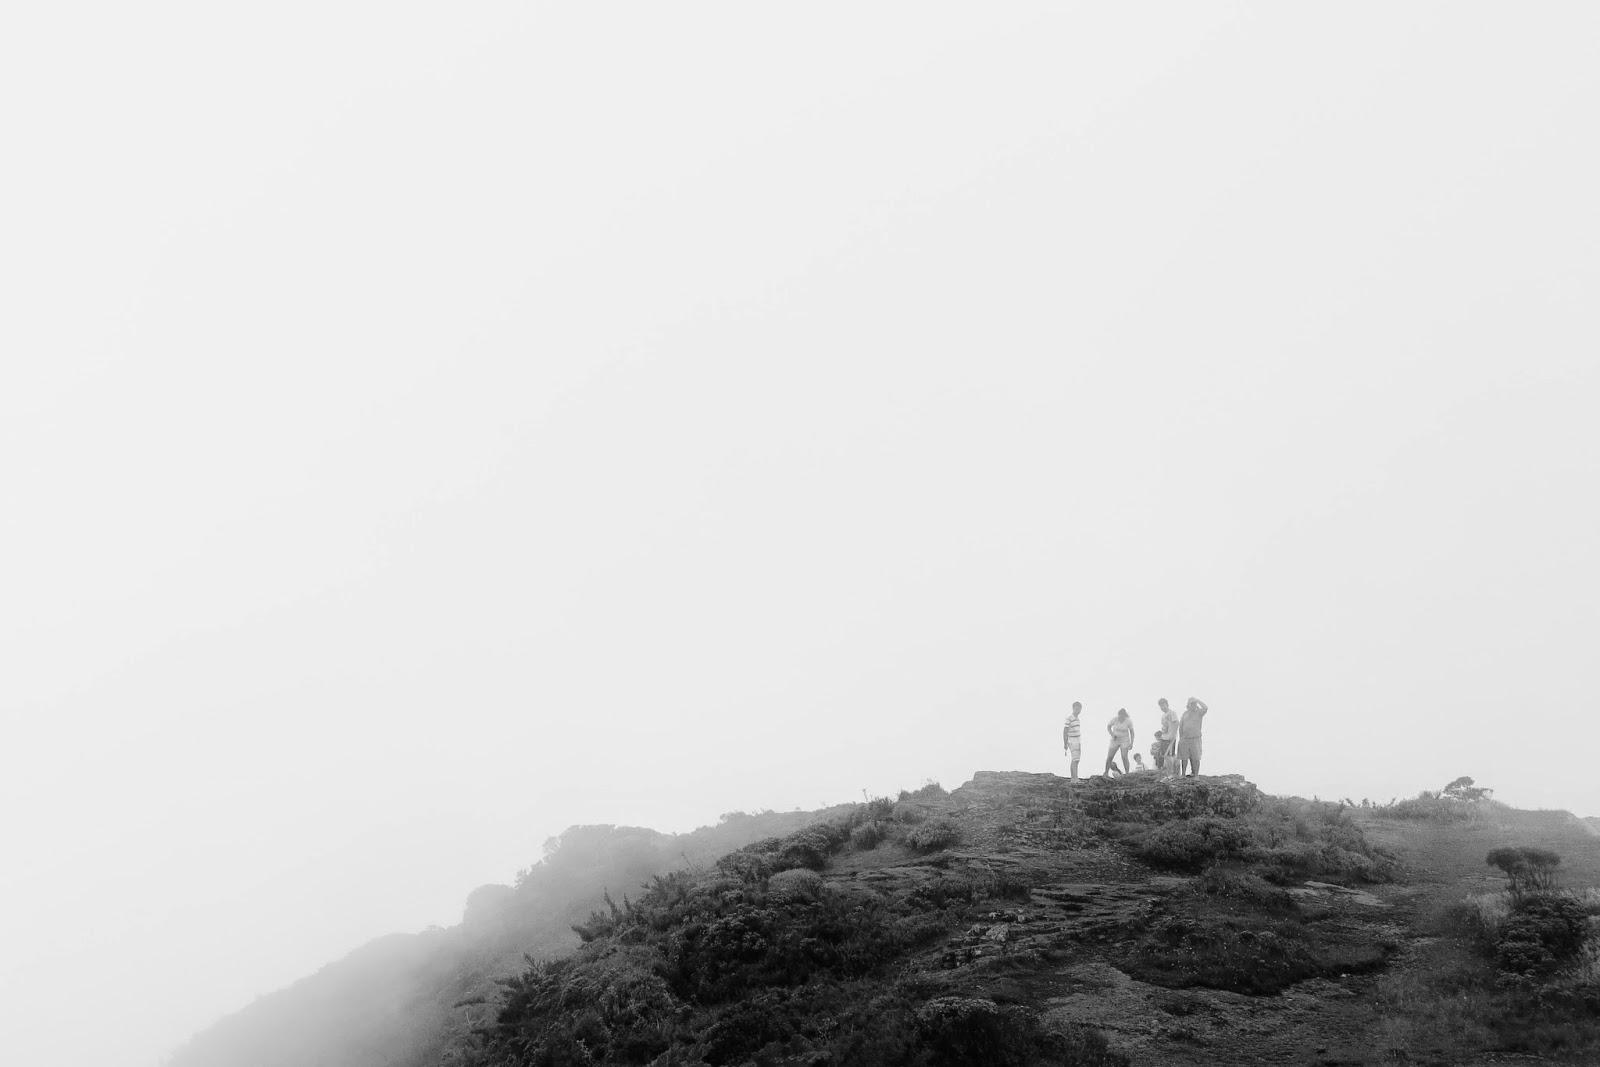 Morro da Igreja em dia de muita neblina